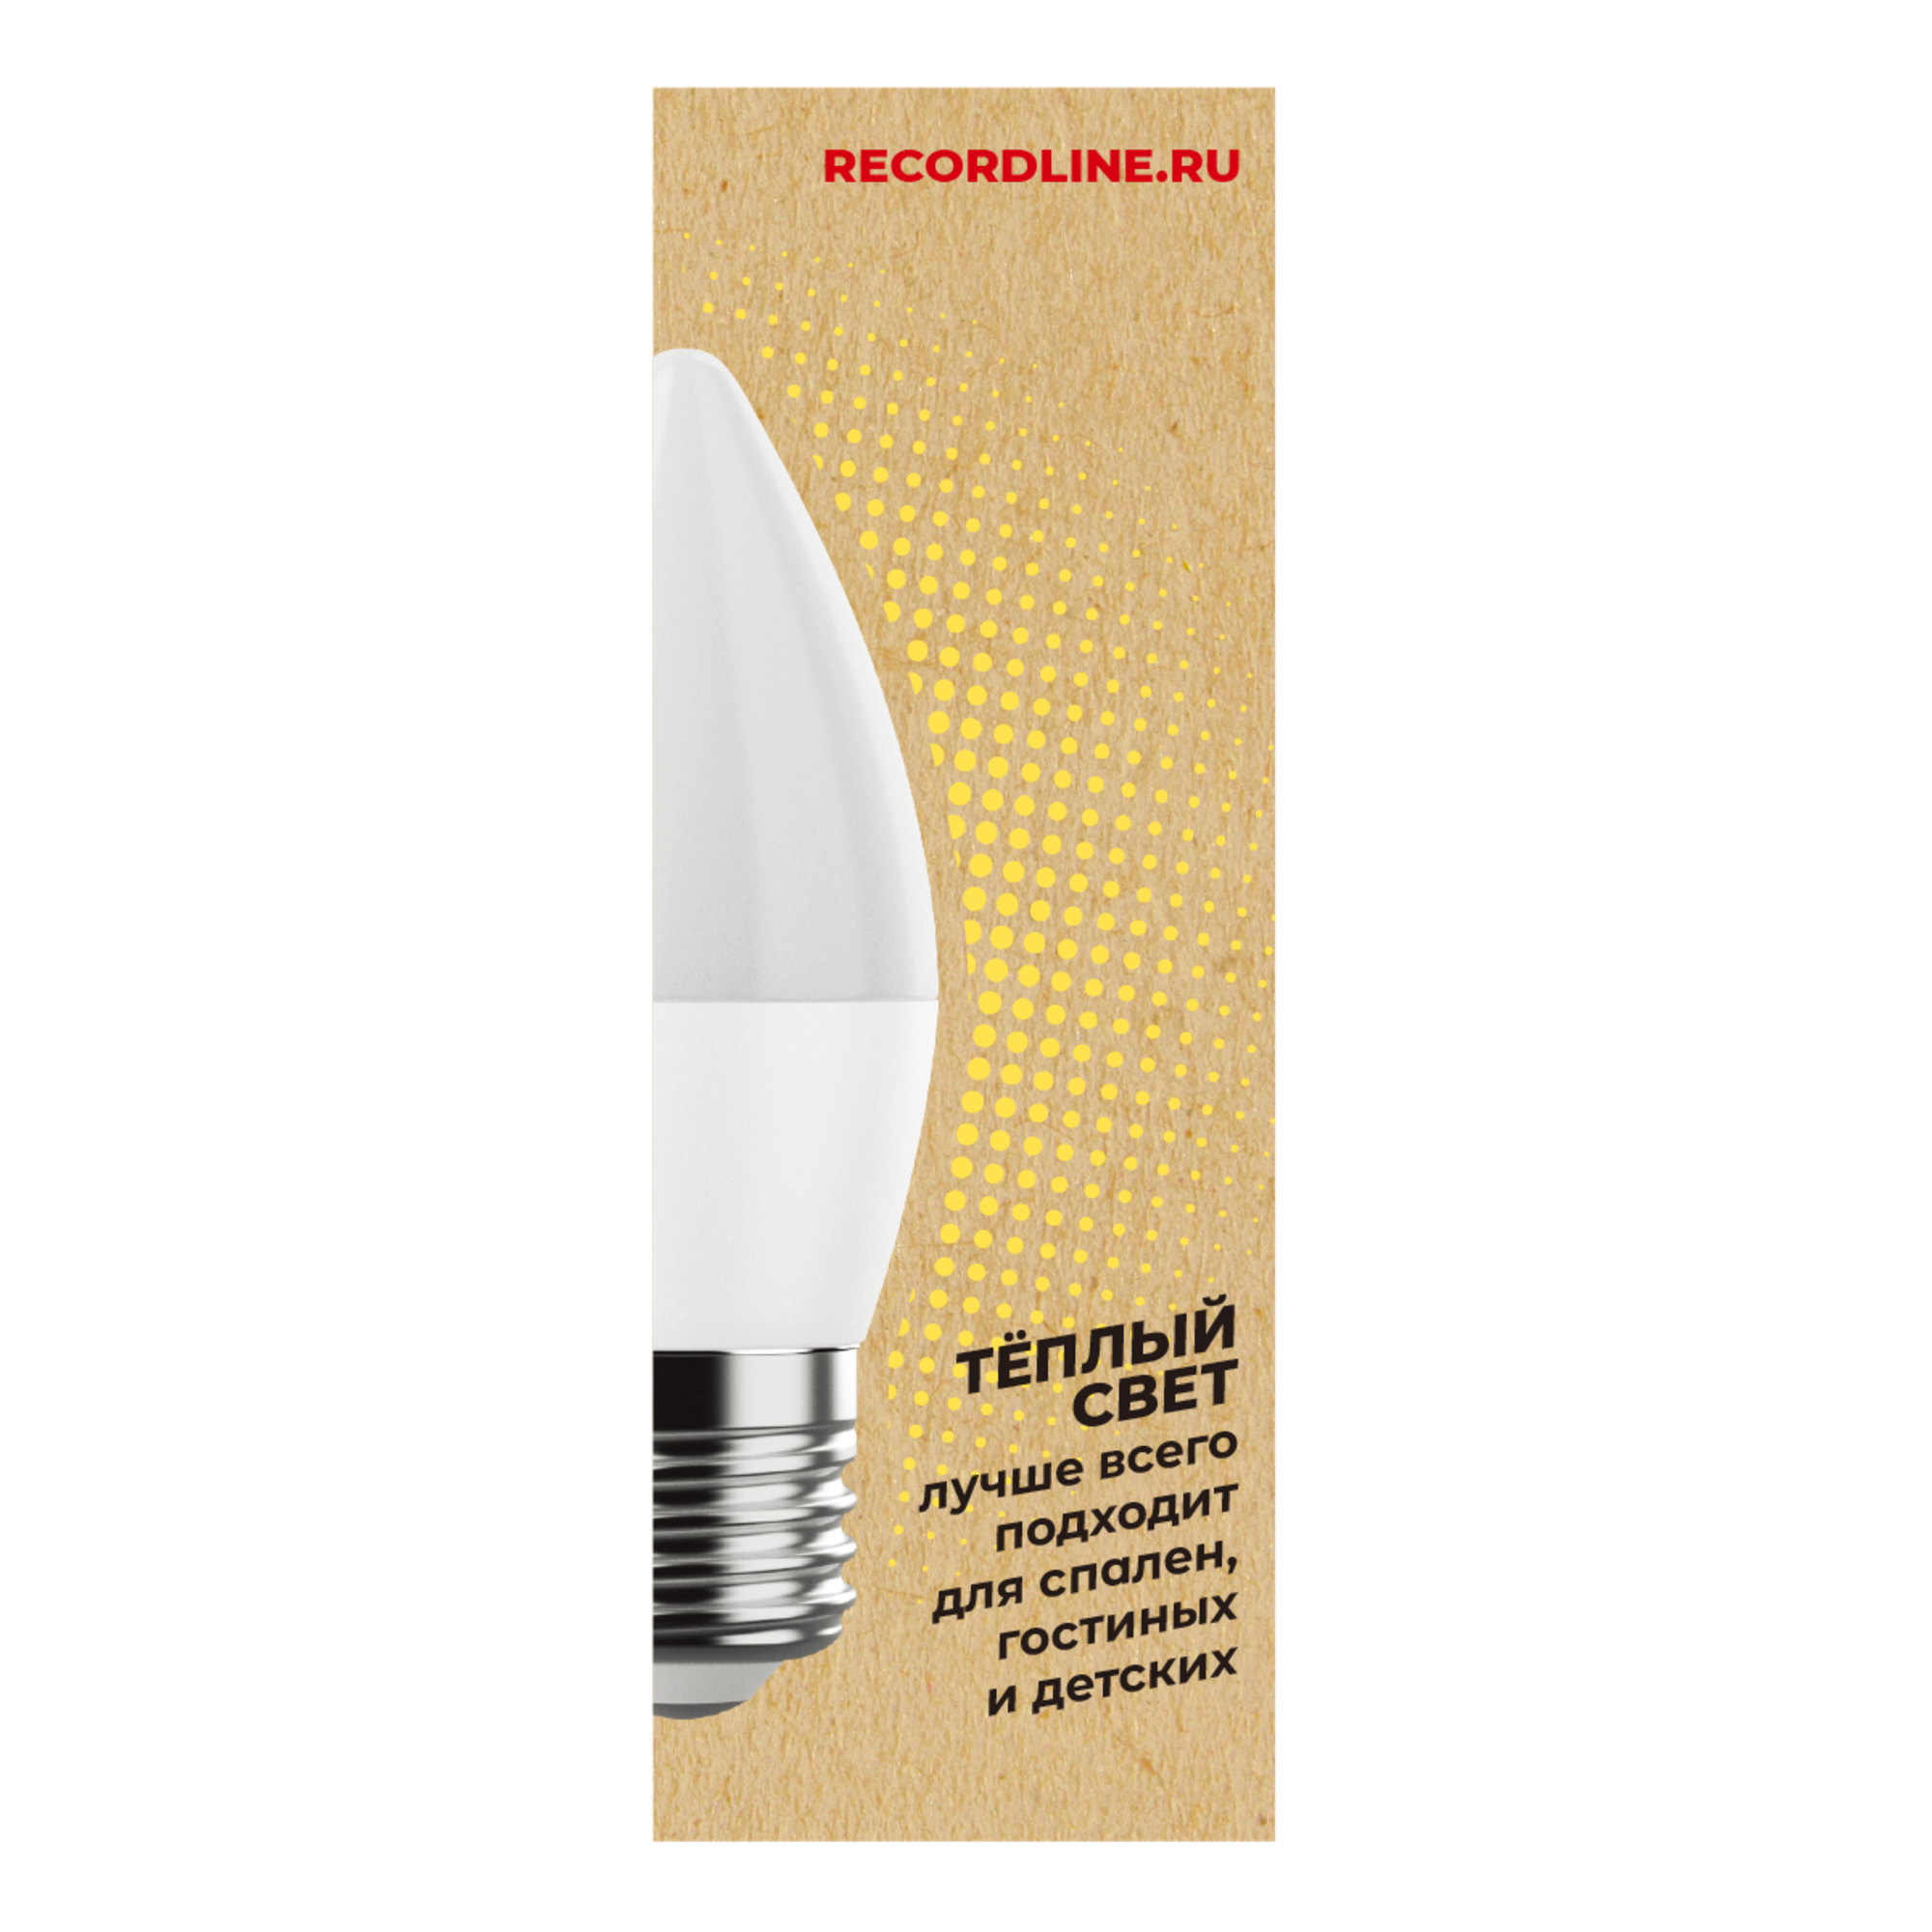 Светодиодная лампочка Рекорд 23881 E27 70 Лм 7 Вт